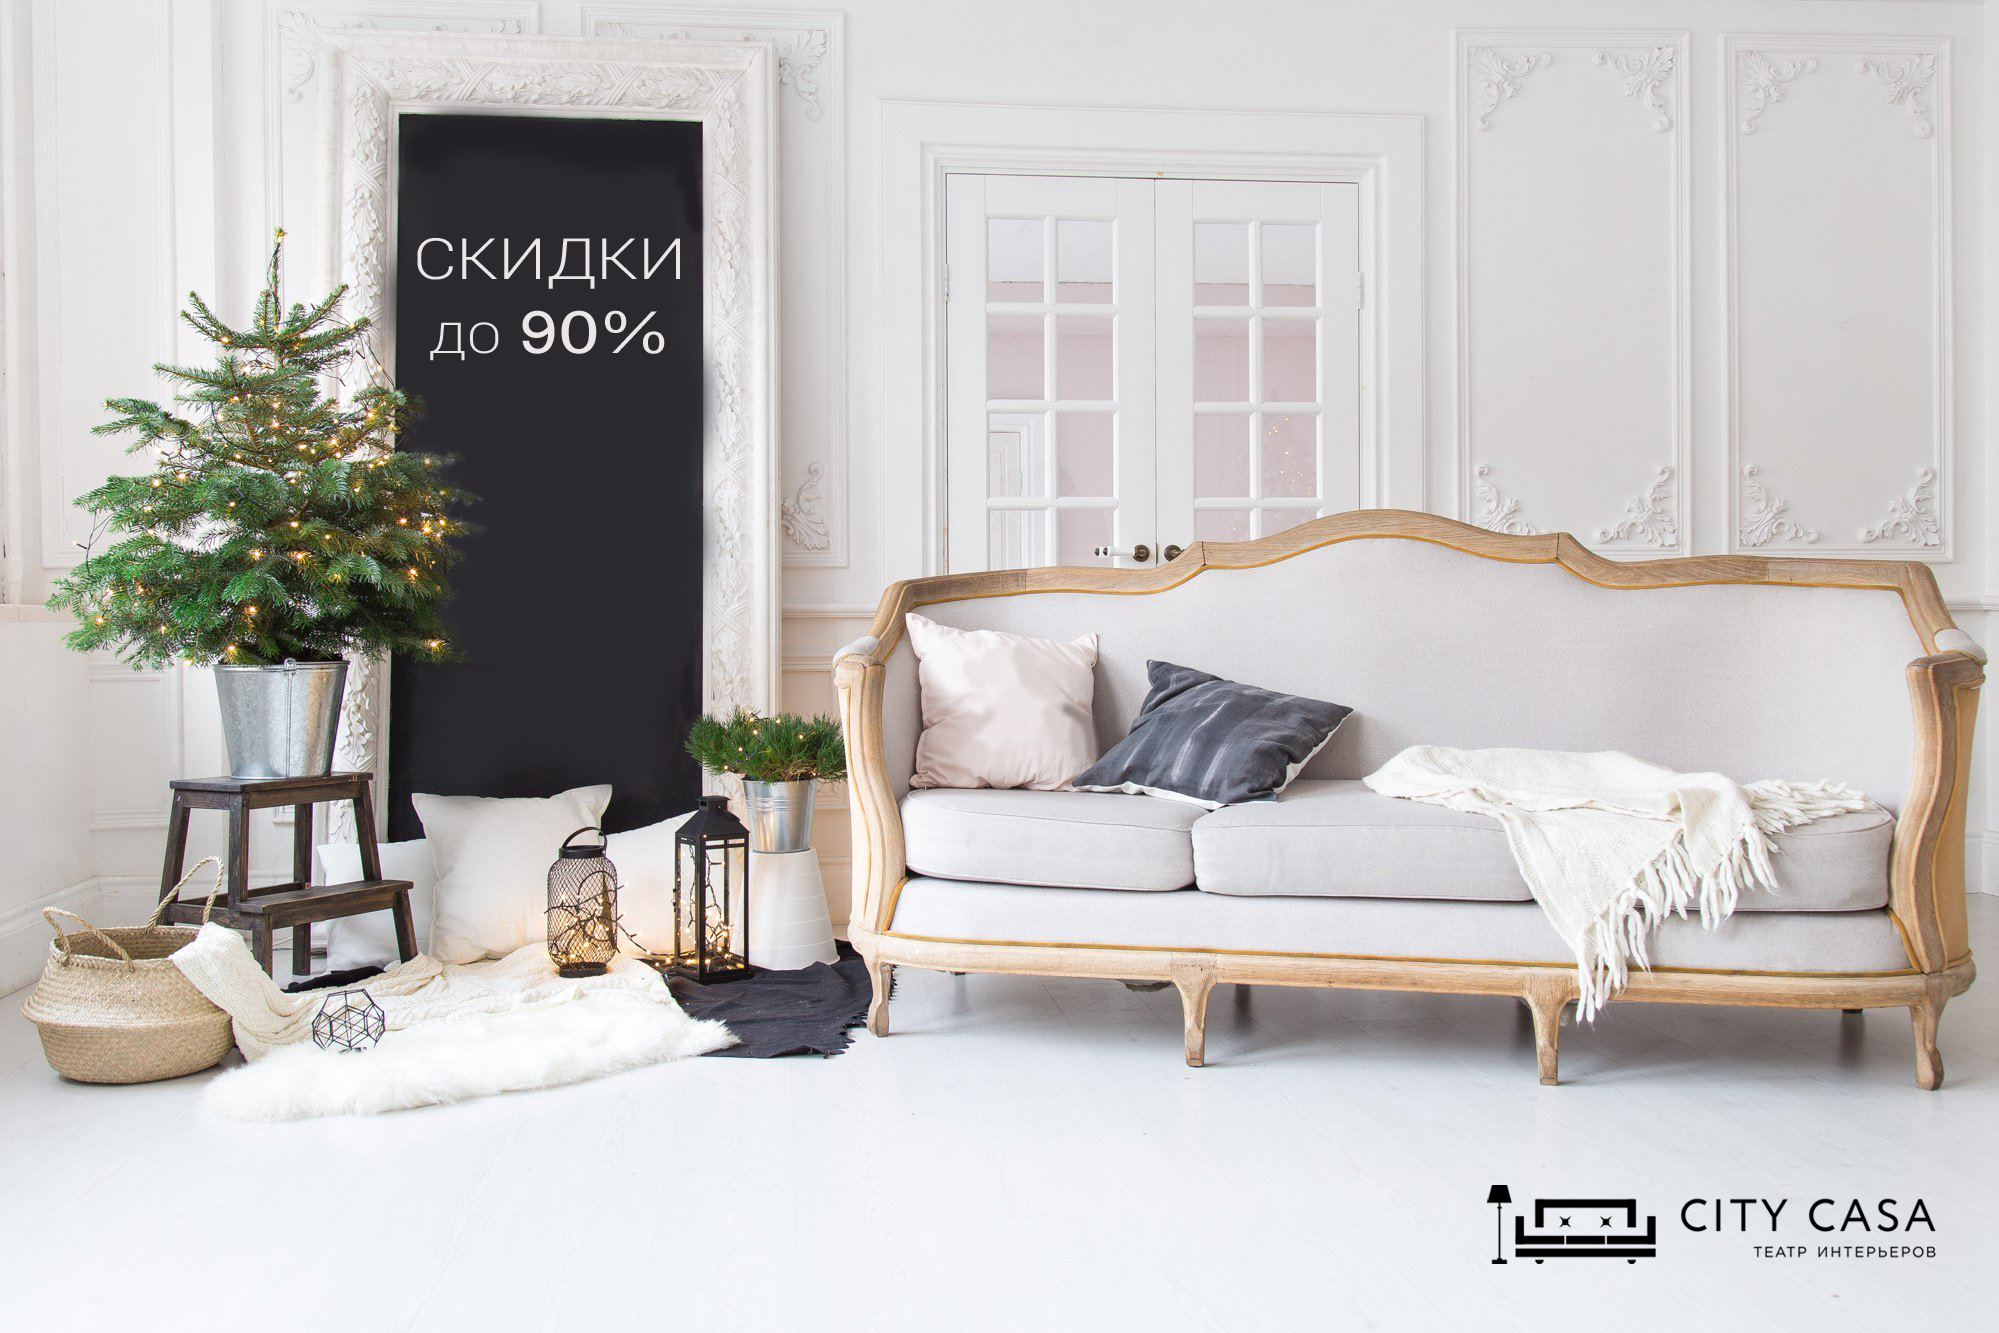 NEW_YEAR_sale_in_City_Casa.jpg